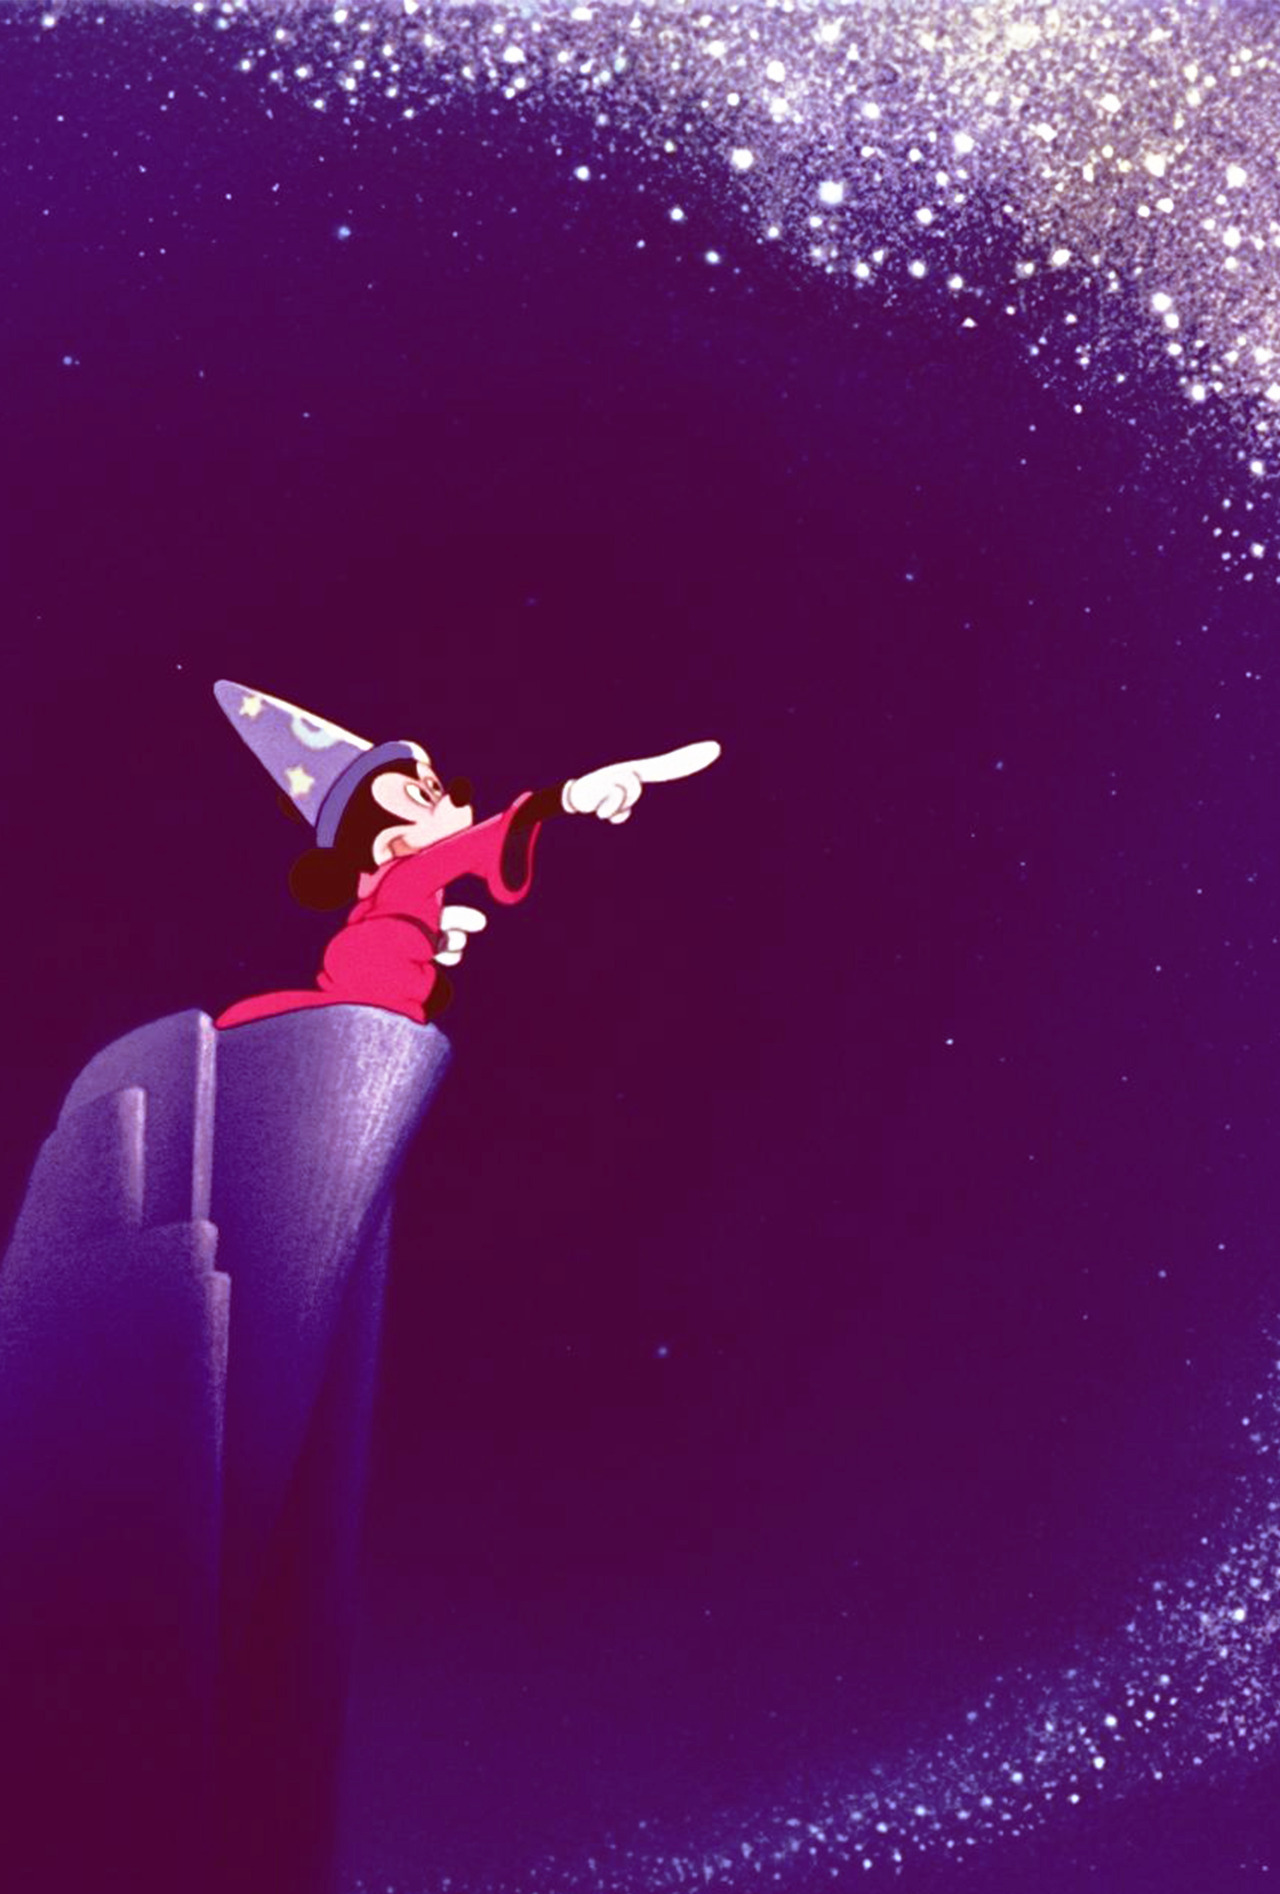 Disney Alice In Wonderland Iphone Wallpaper Photoset Tangled Disney